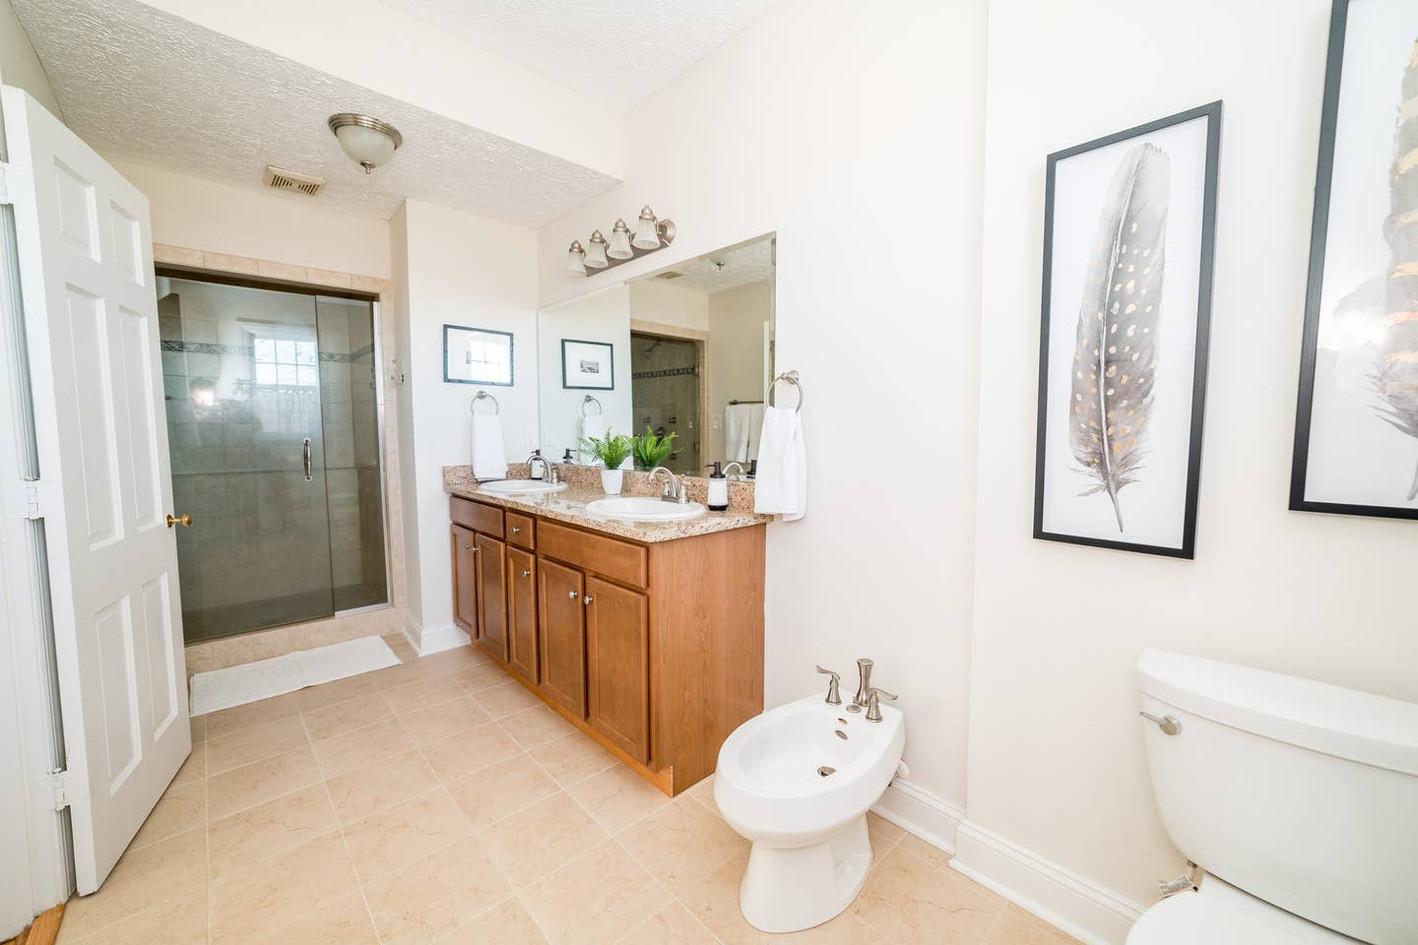 Retreat House - Winesap Room - bath